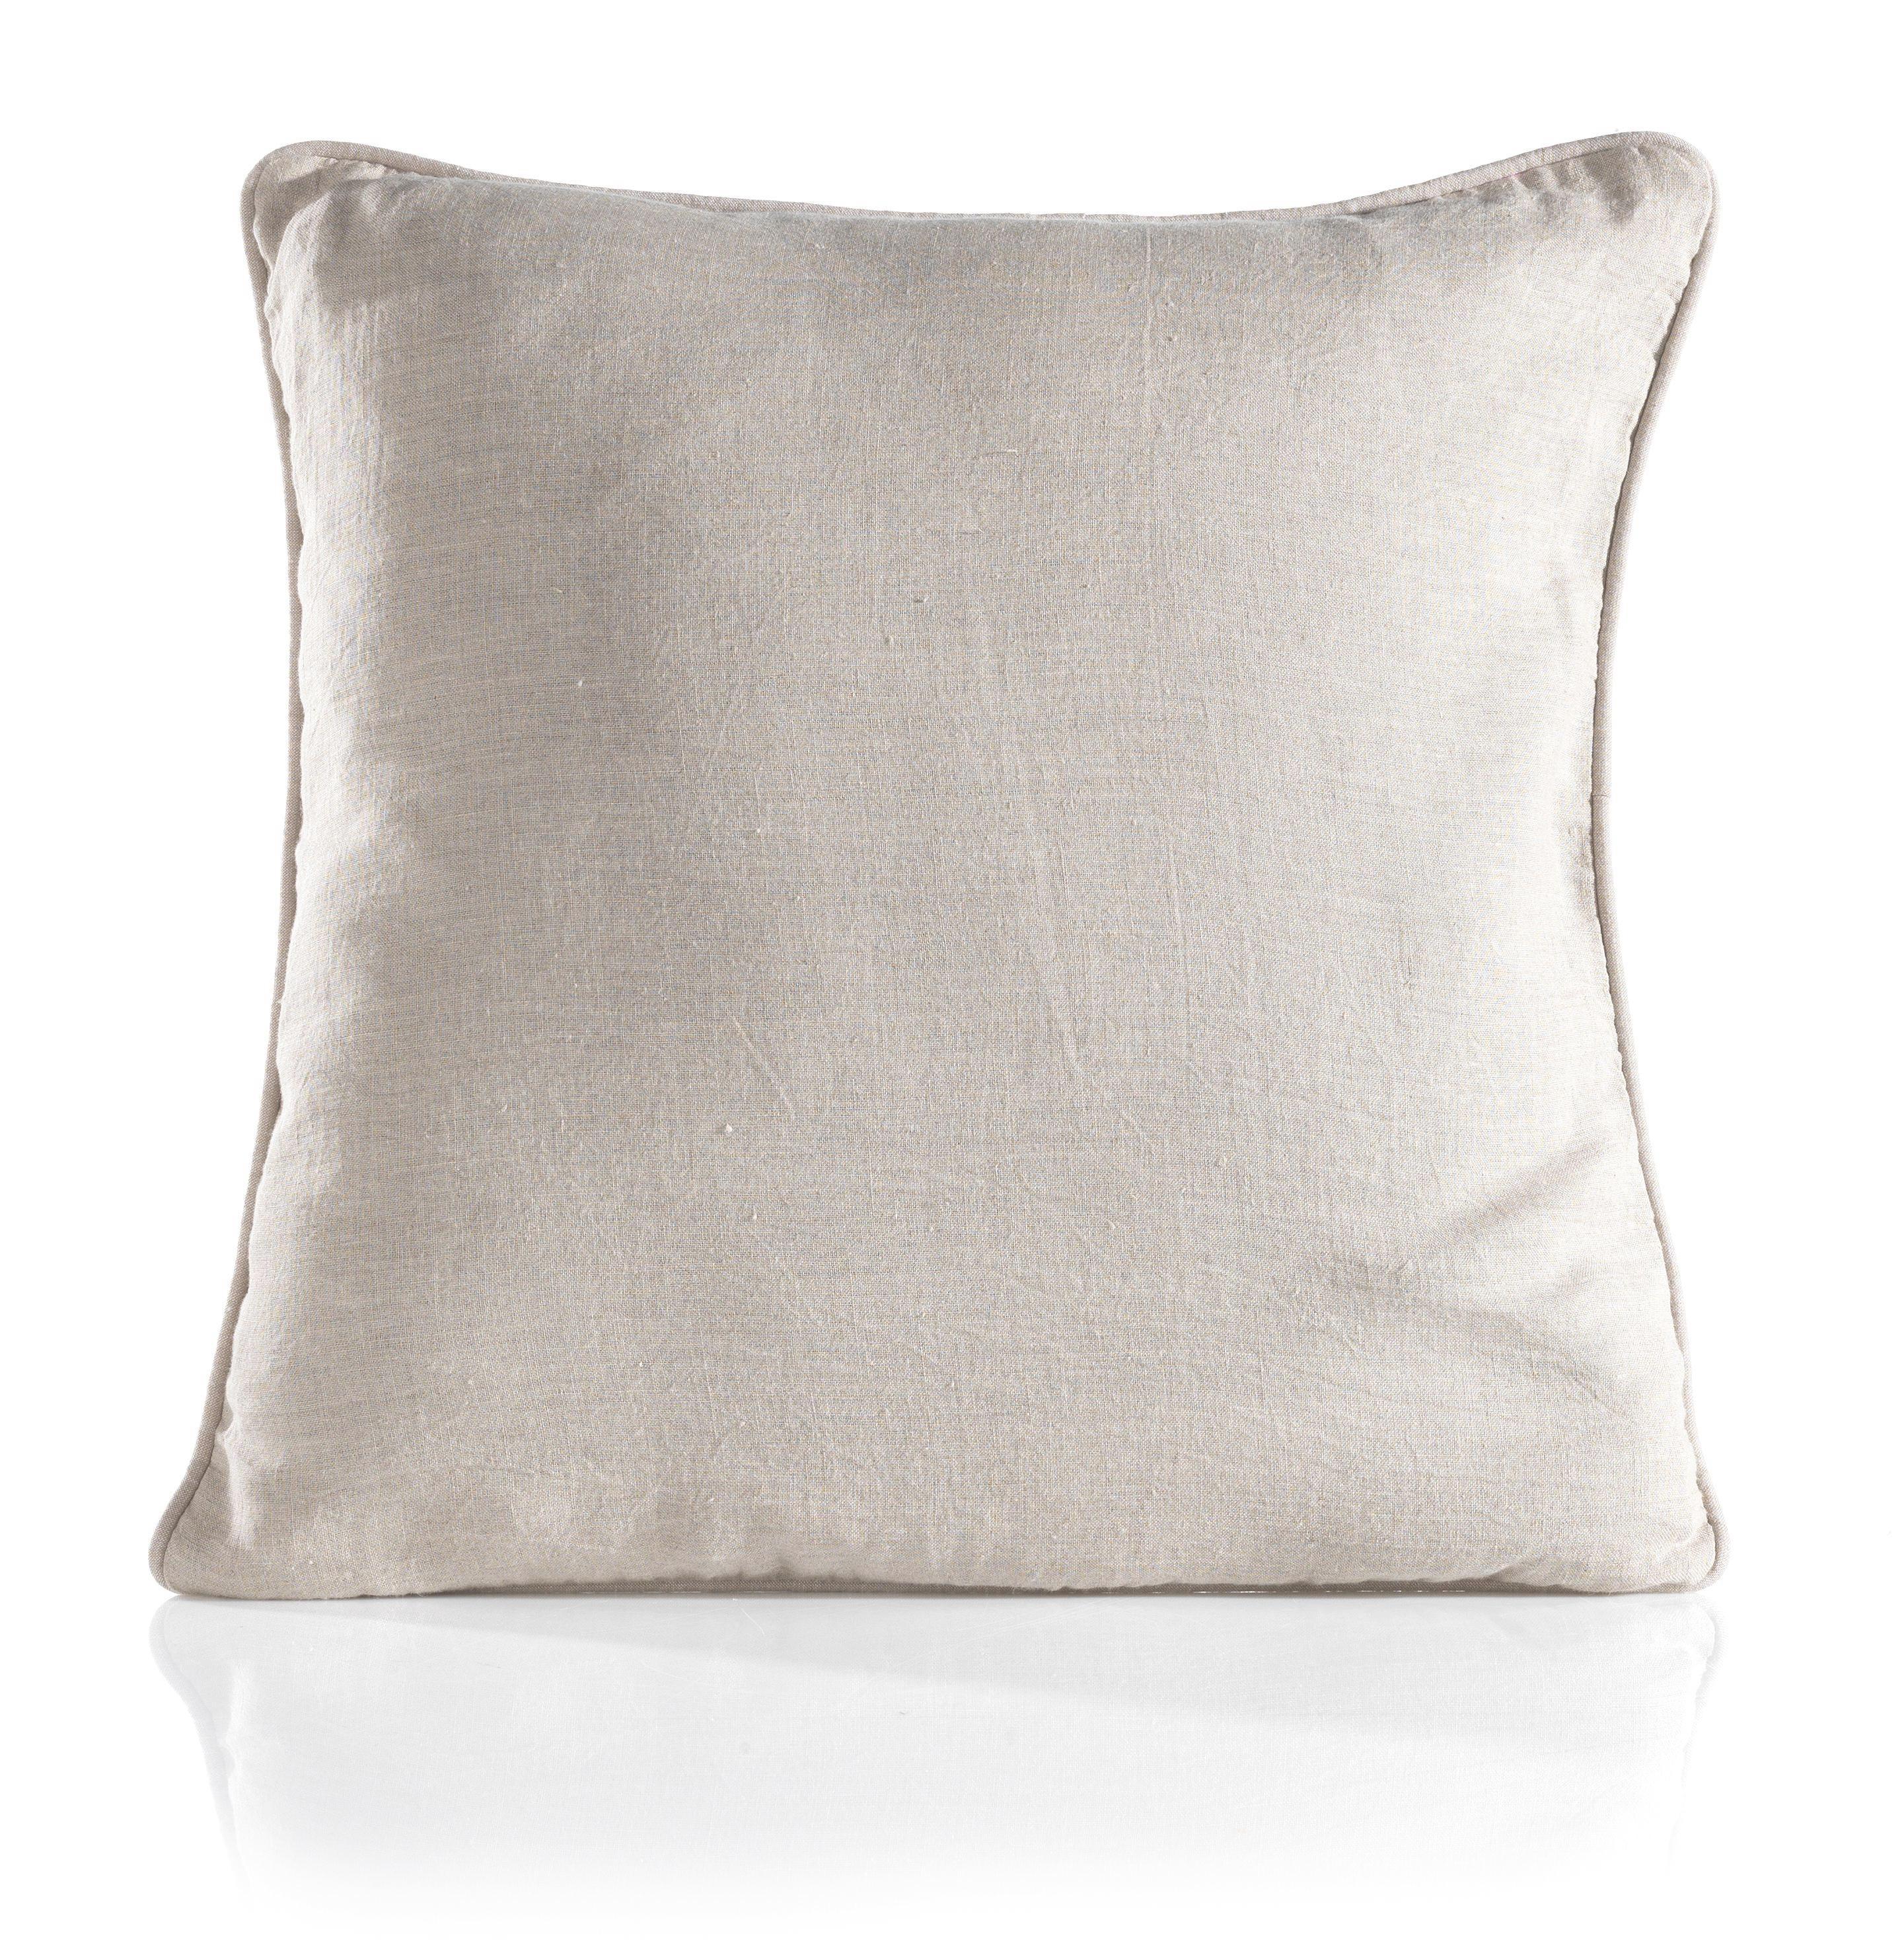 Zierkissen Harald 50x50cm - Hellgrau, Textil (50/50cm) - MÖMAX modern living